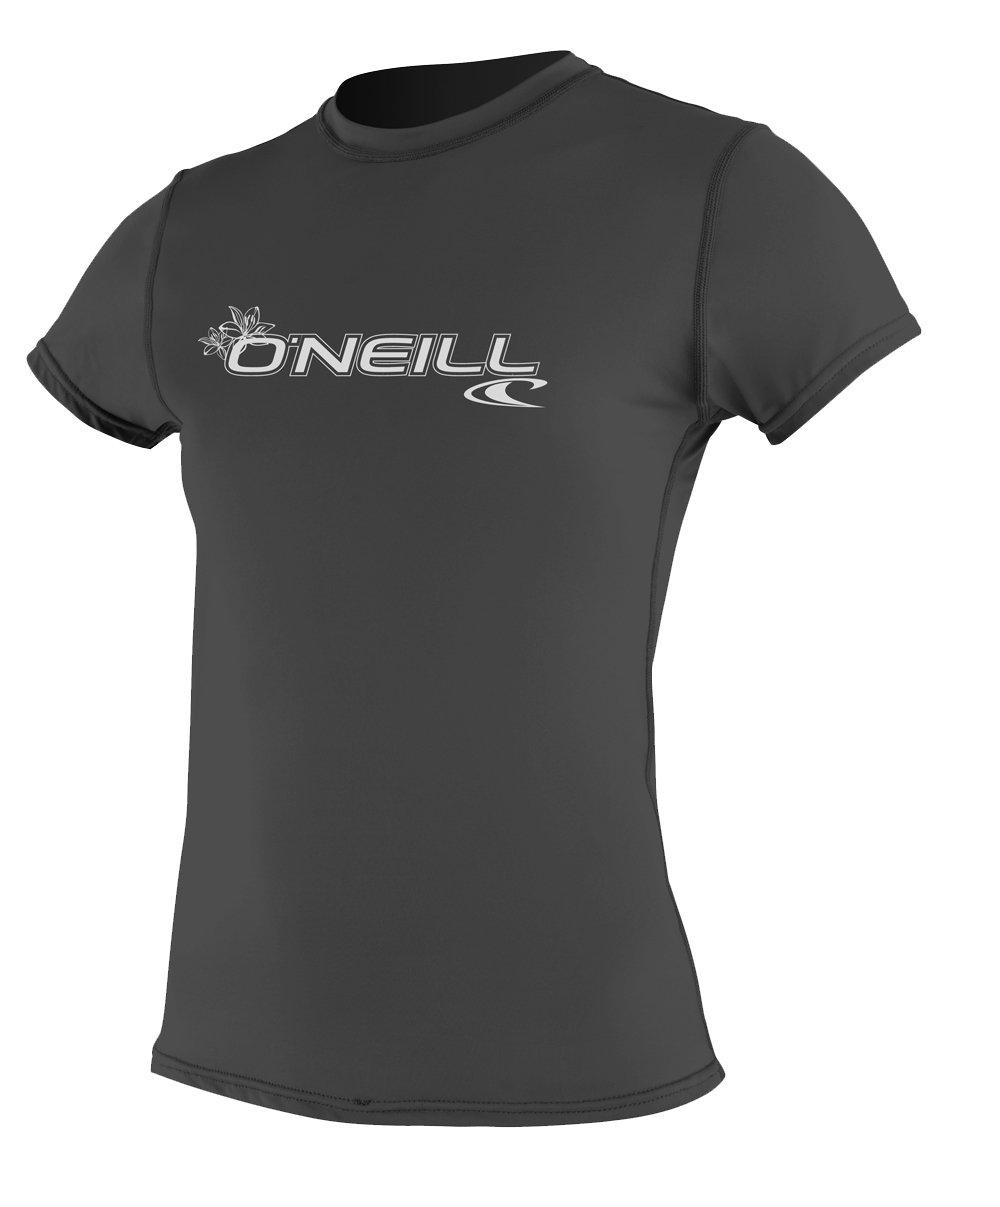 O'Neill  Women's Basic Skins Upf 50+ Short Sleeve Sun Shirt, Black, X-Small